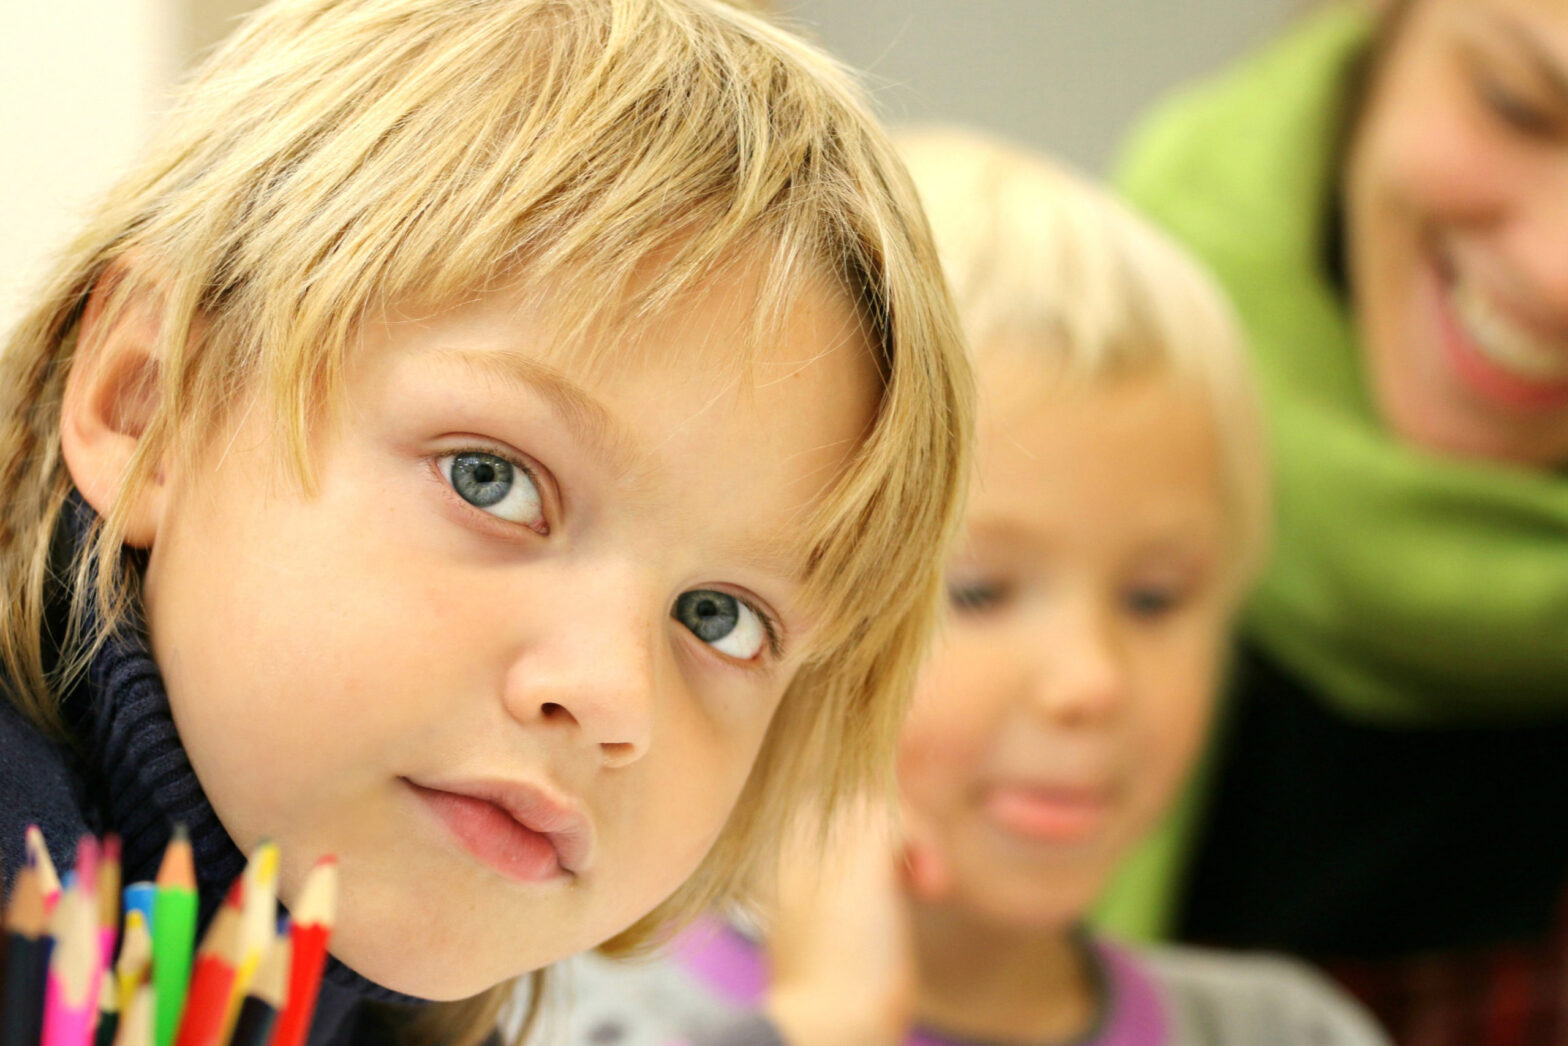 Increasing childcare enrollment after the coronavirus pandemic